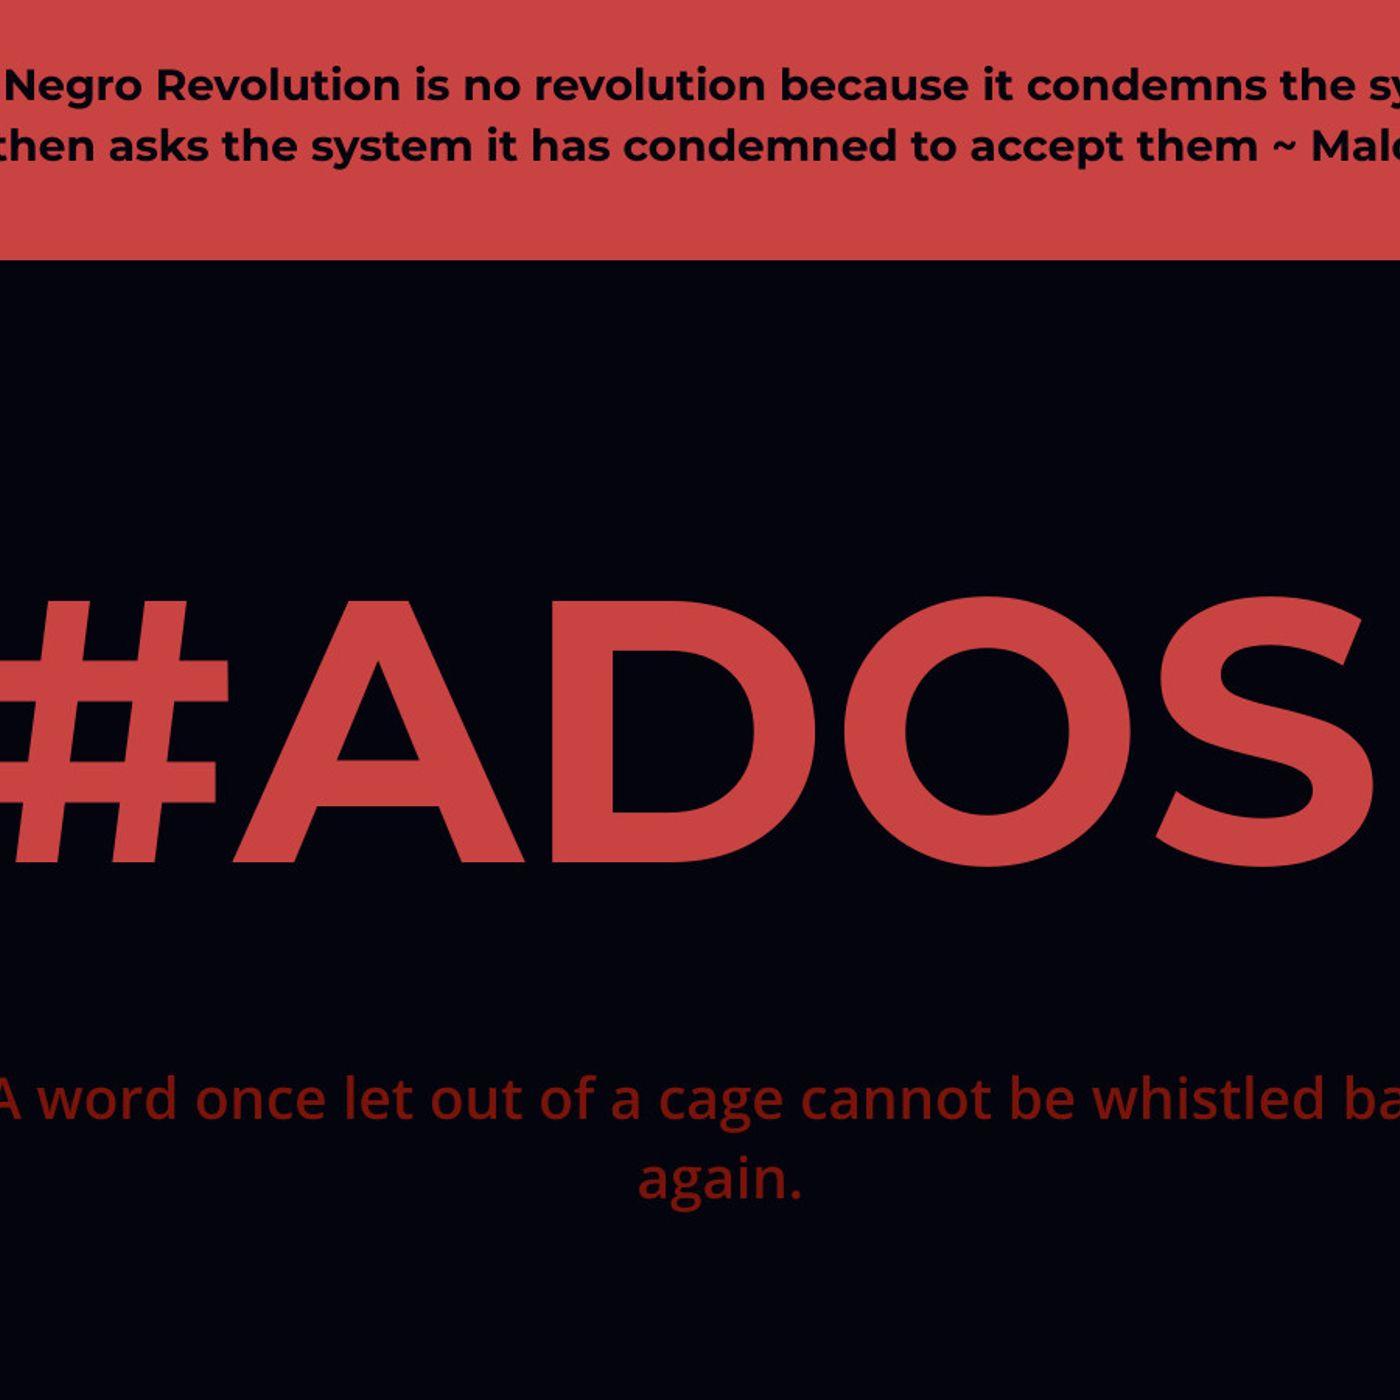 #Ados - T&Y are failing black people